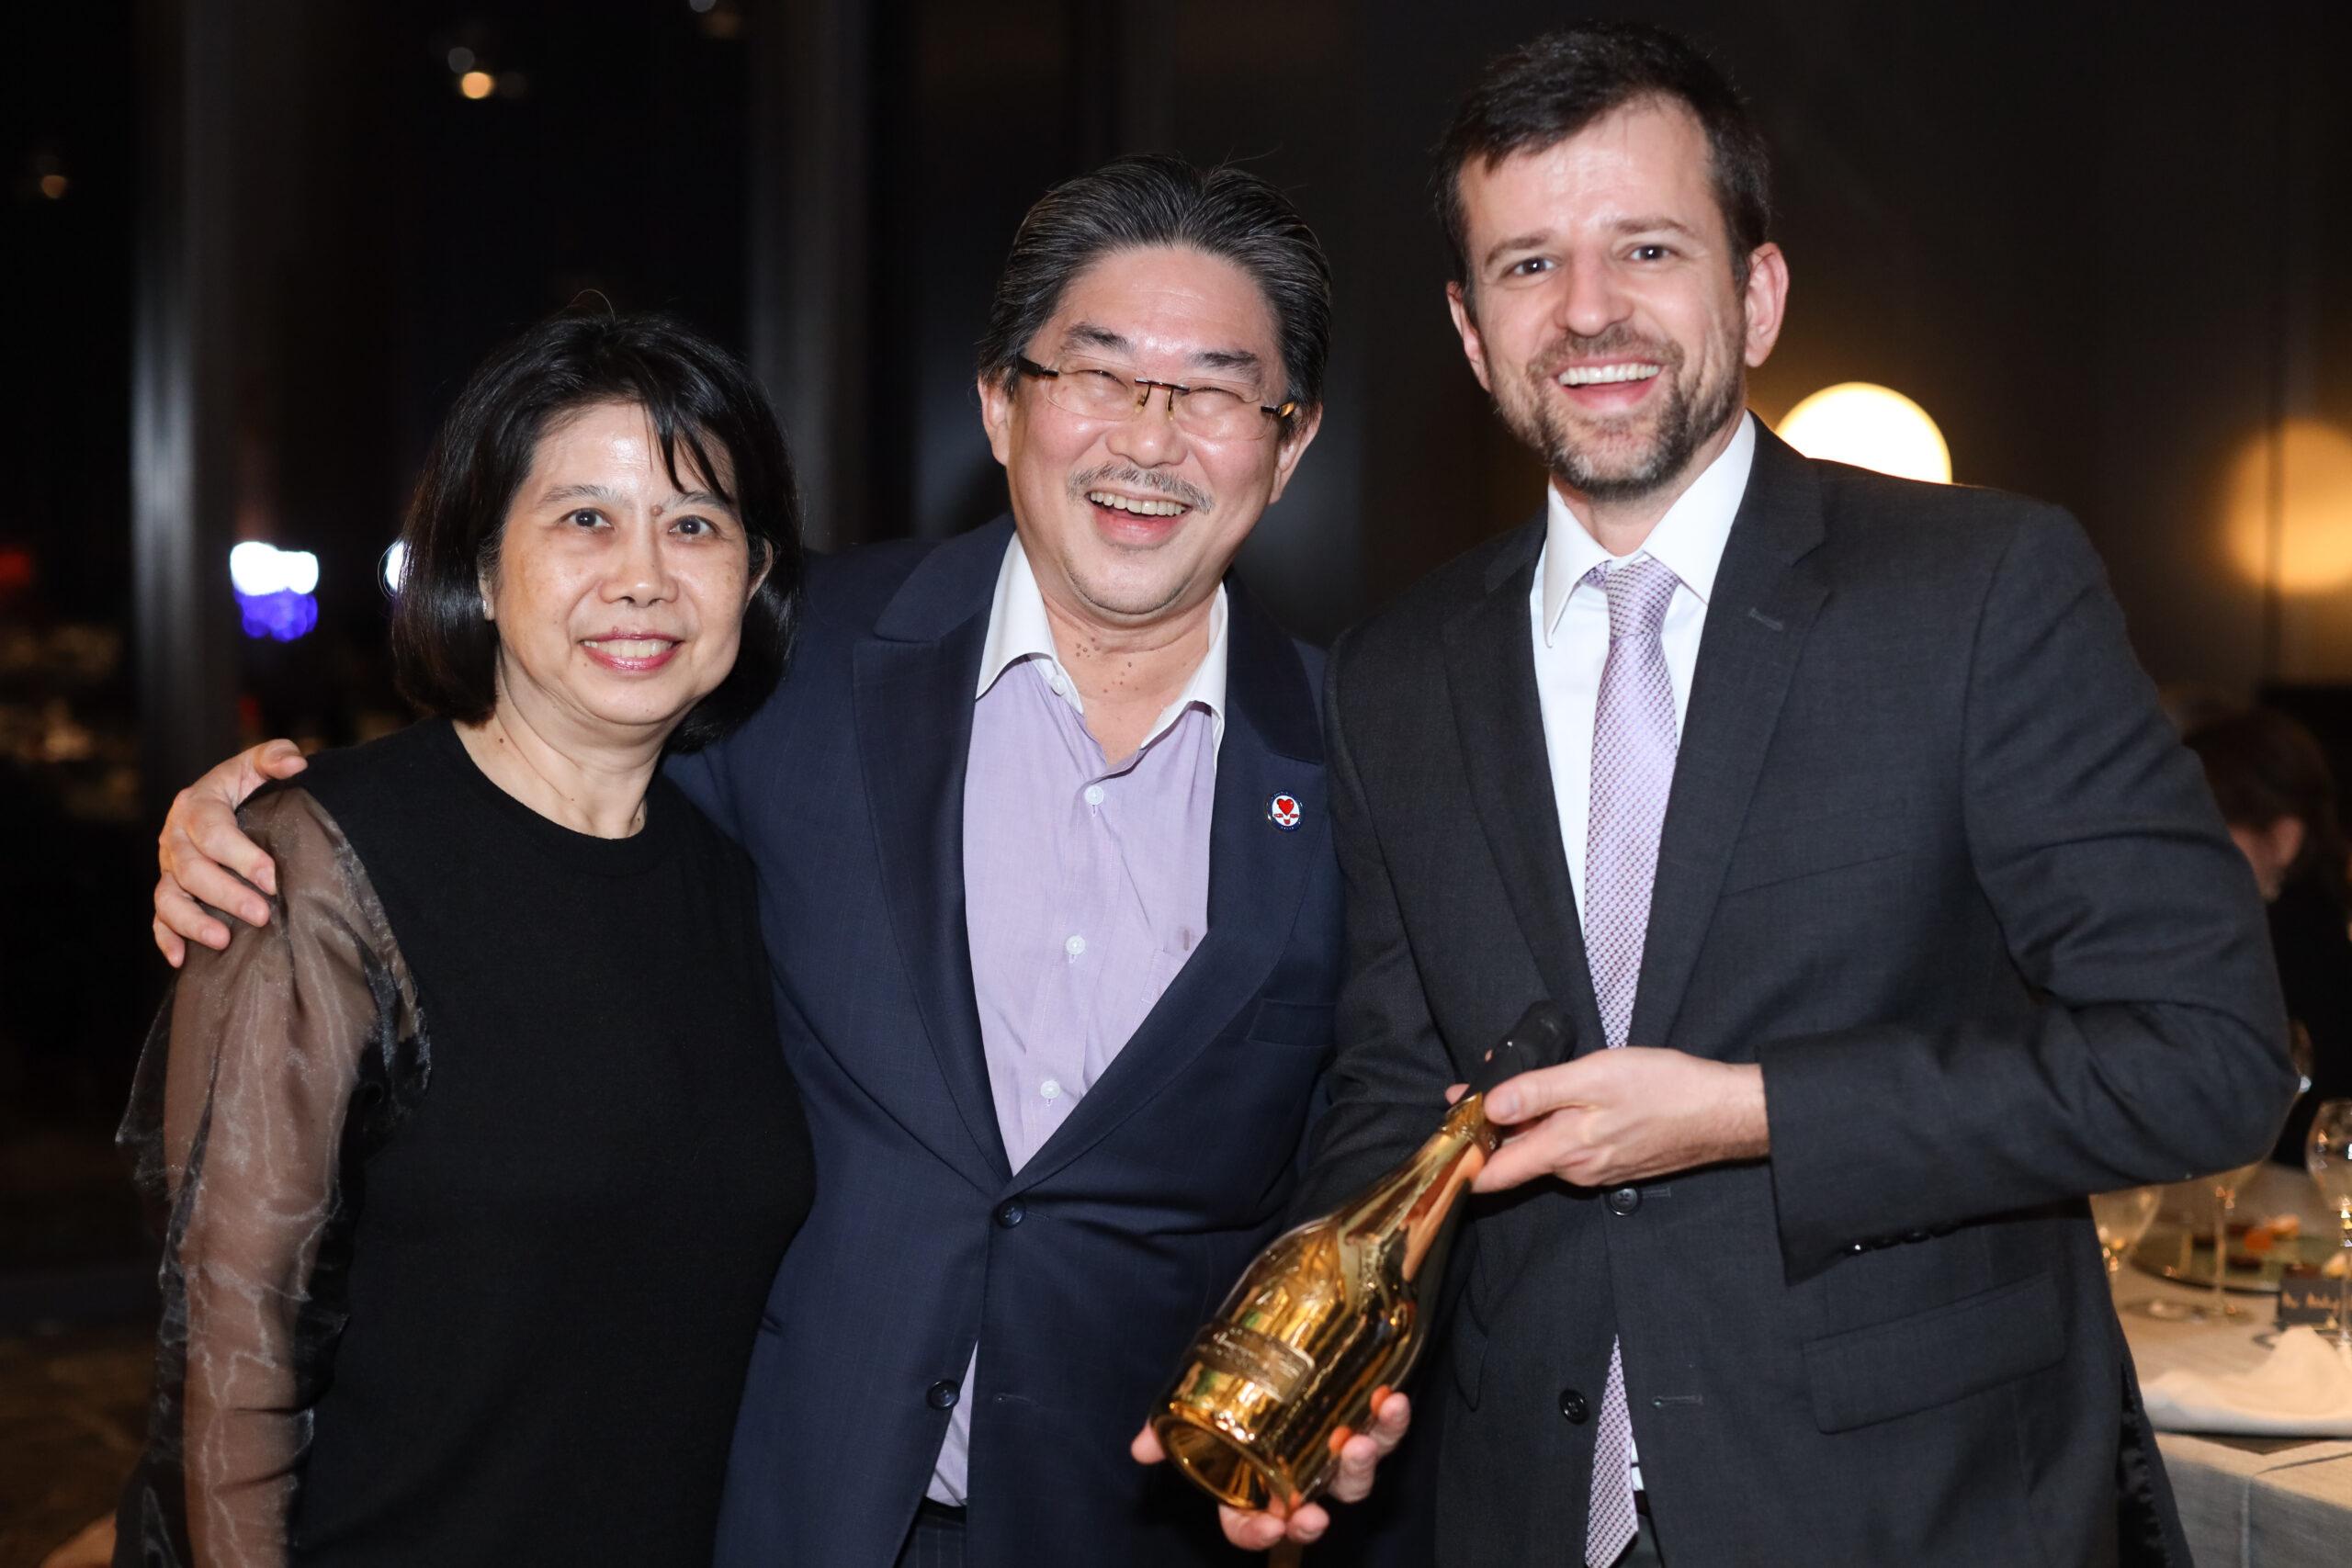 ARMAND DE BRIGNAC HOSTS FIRST DINNER IN MALAYSIA AT NEWLY-OPENED SABAYON - Armand de Brignac Champagne